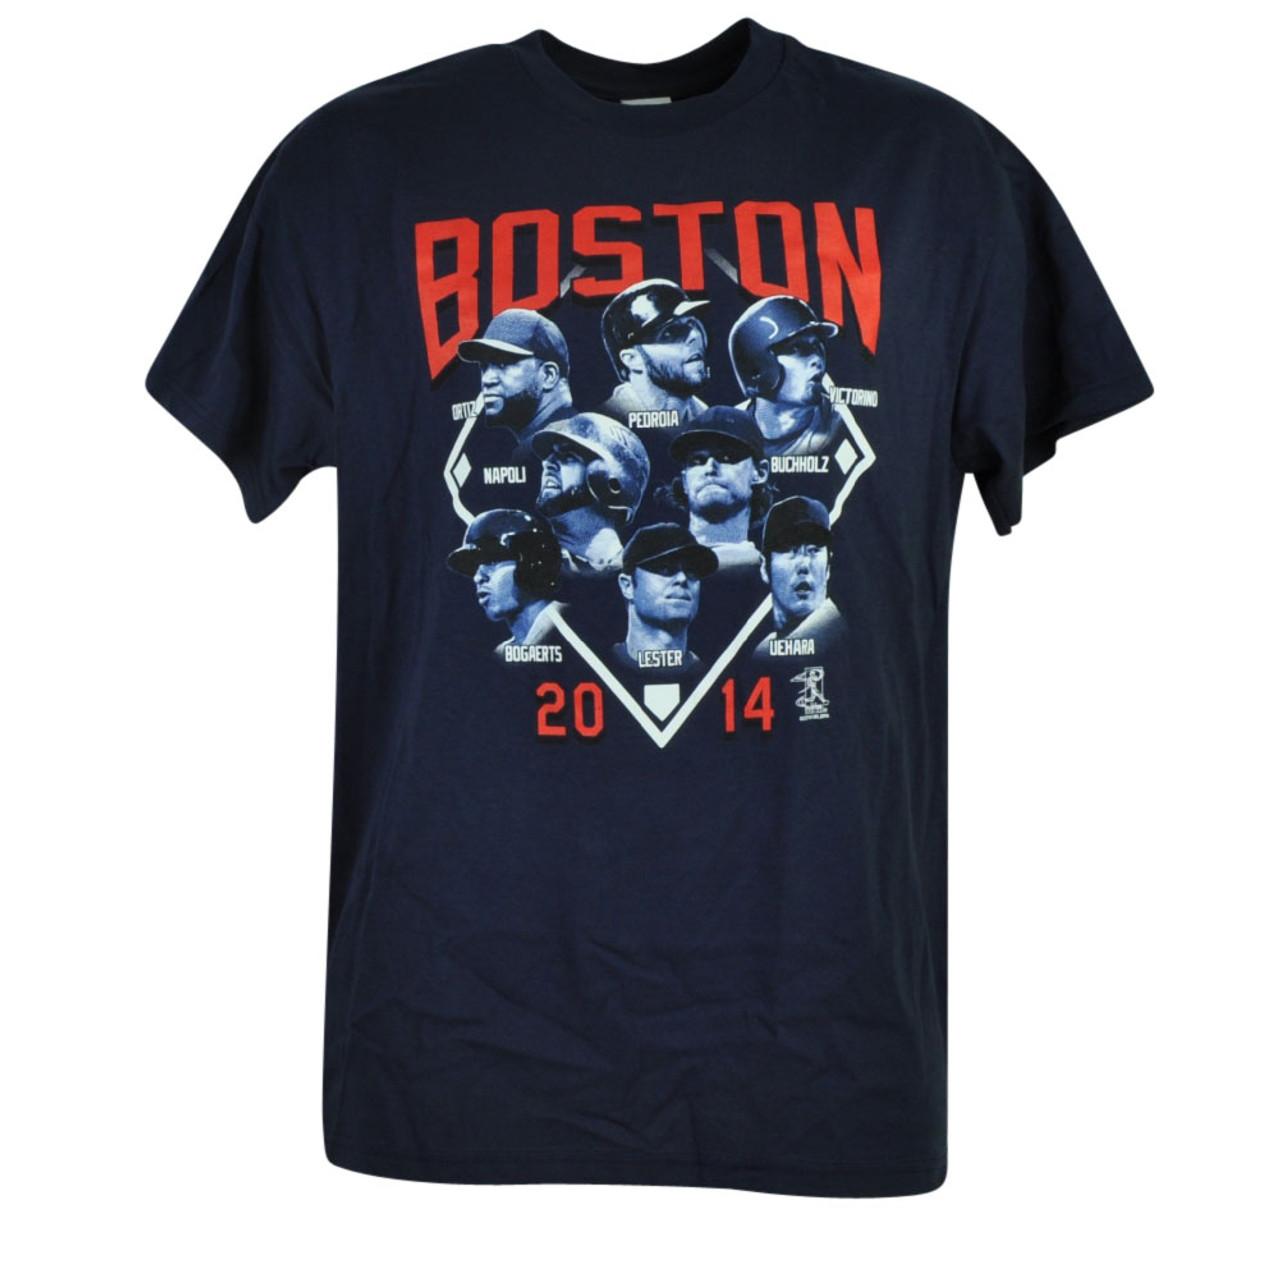 the latest 3d713 dba5f MLB Boston Red Sox Lester Pedroia Napoli Ortiz Victorino Buchholz Tshirt  Tee Men